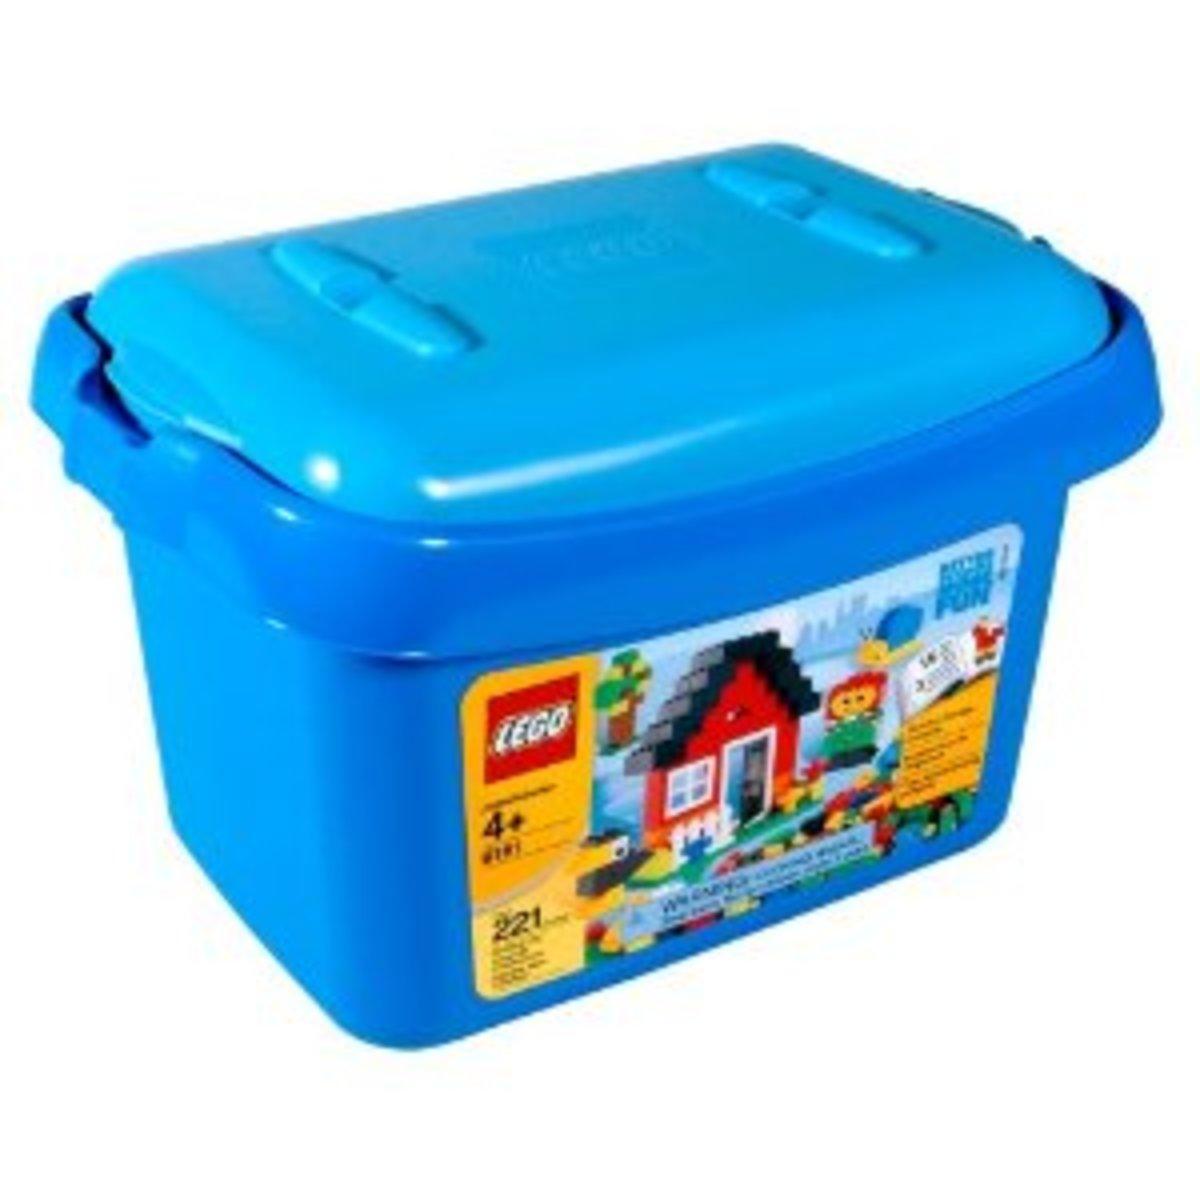 Lego Blue Brick Set